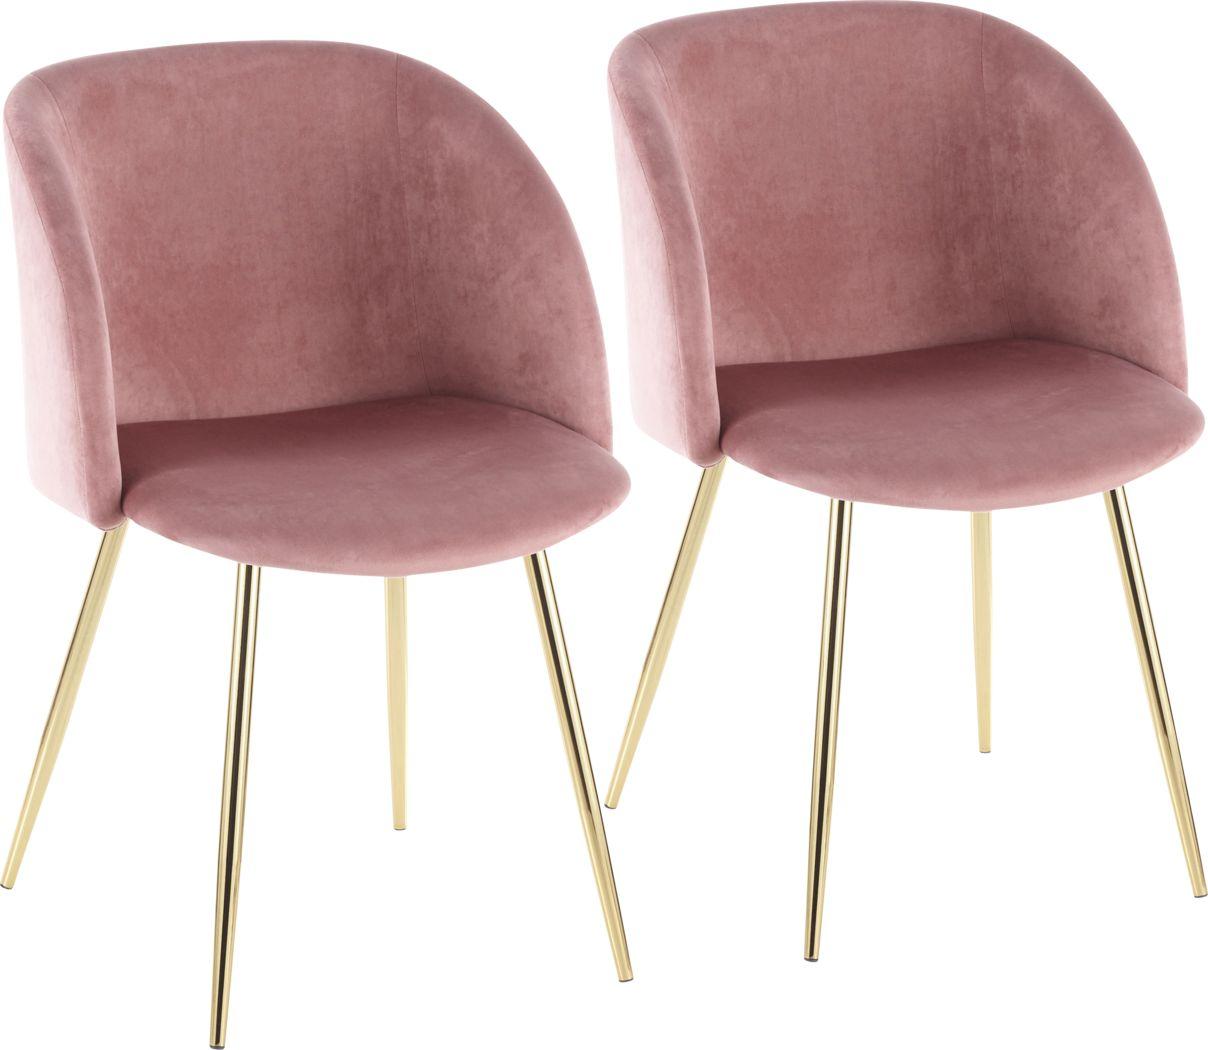 Lobolly Pink Side Chair, Set of 2